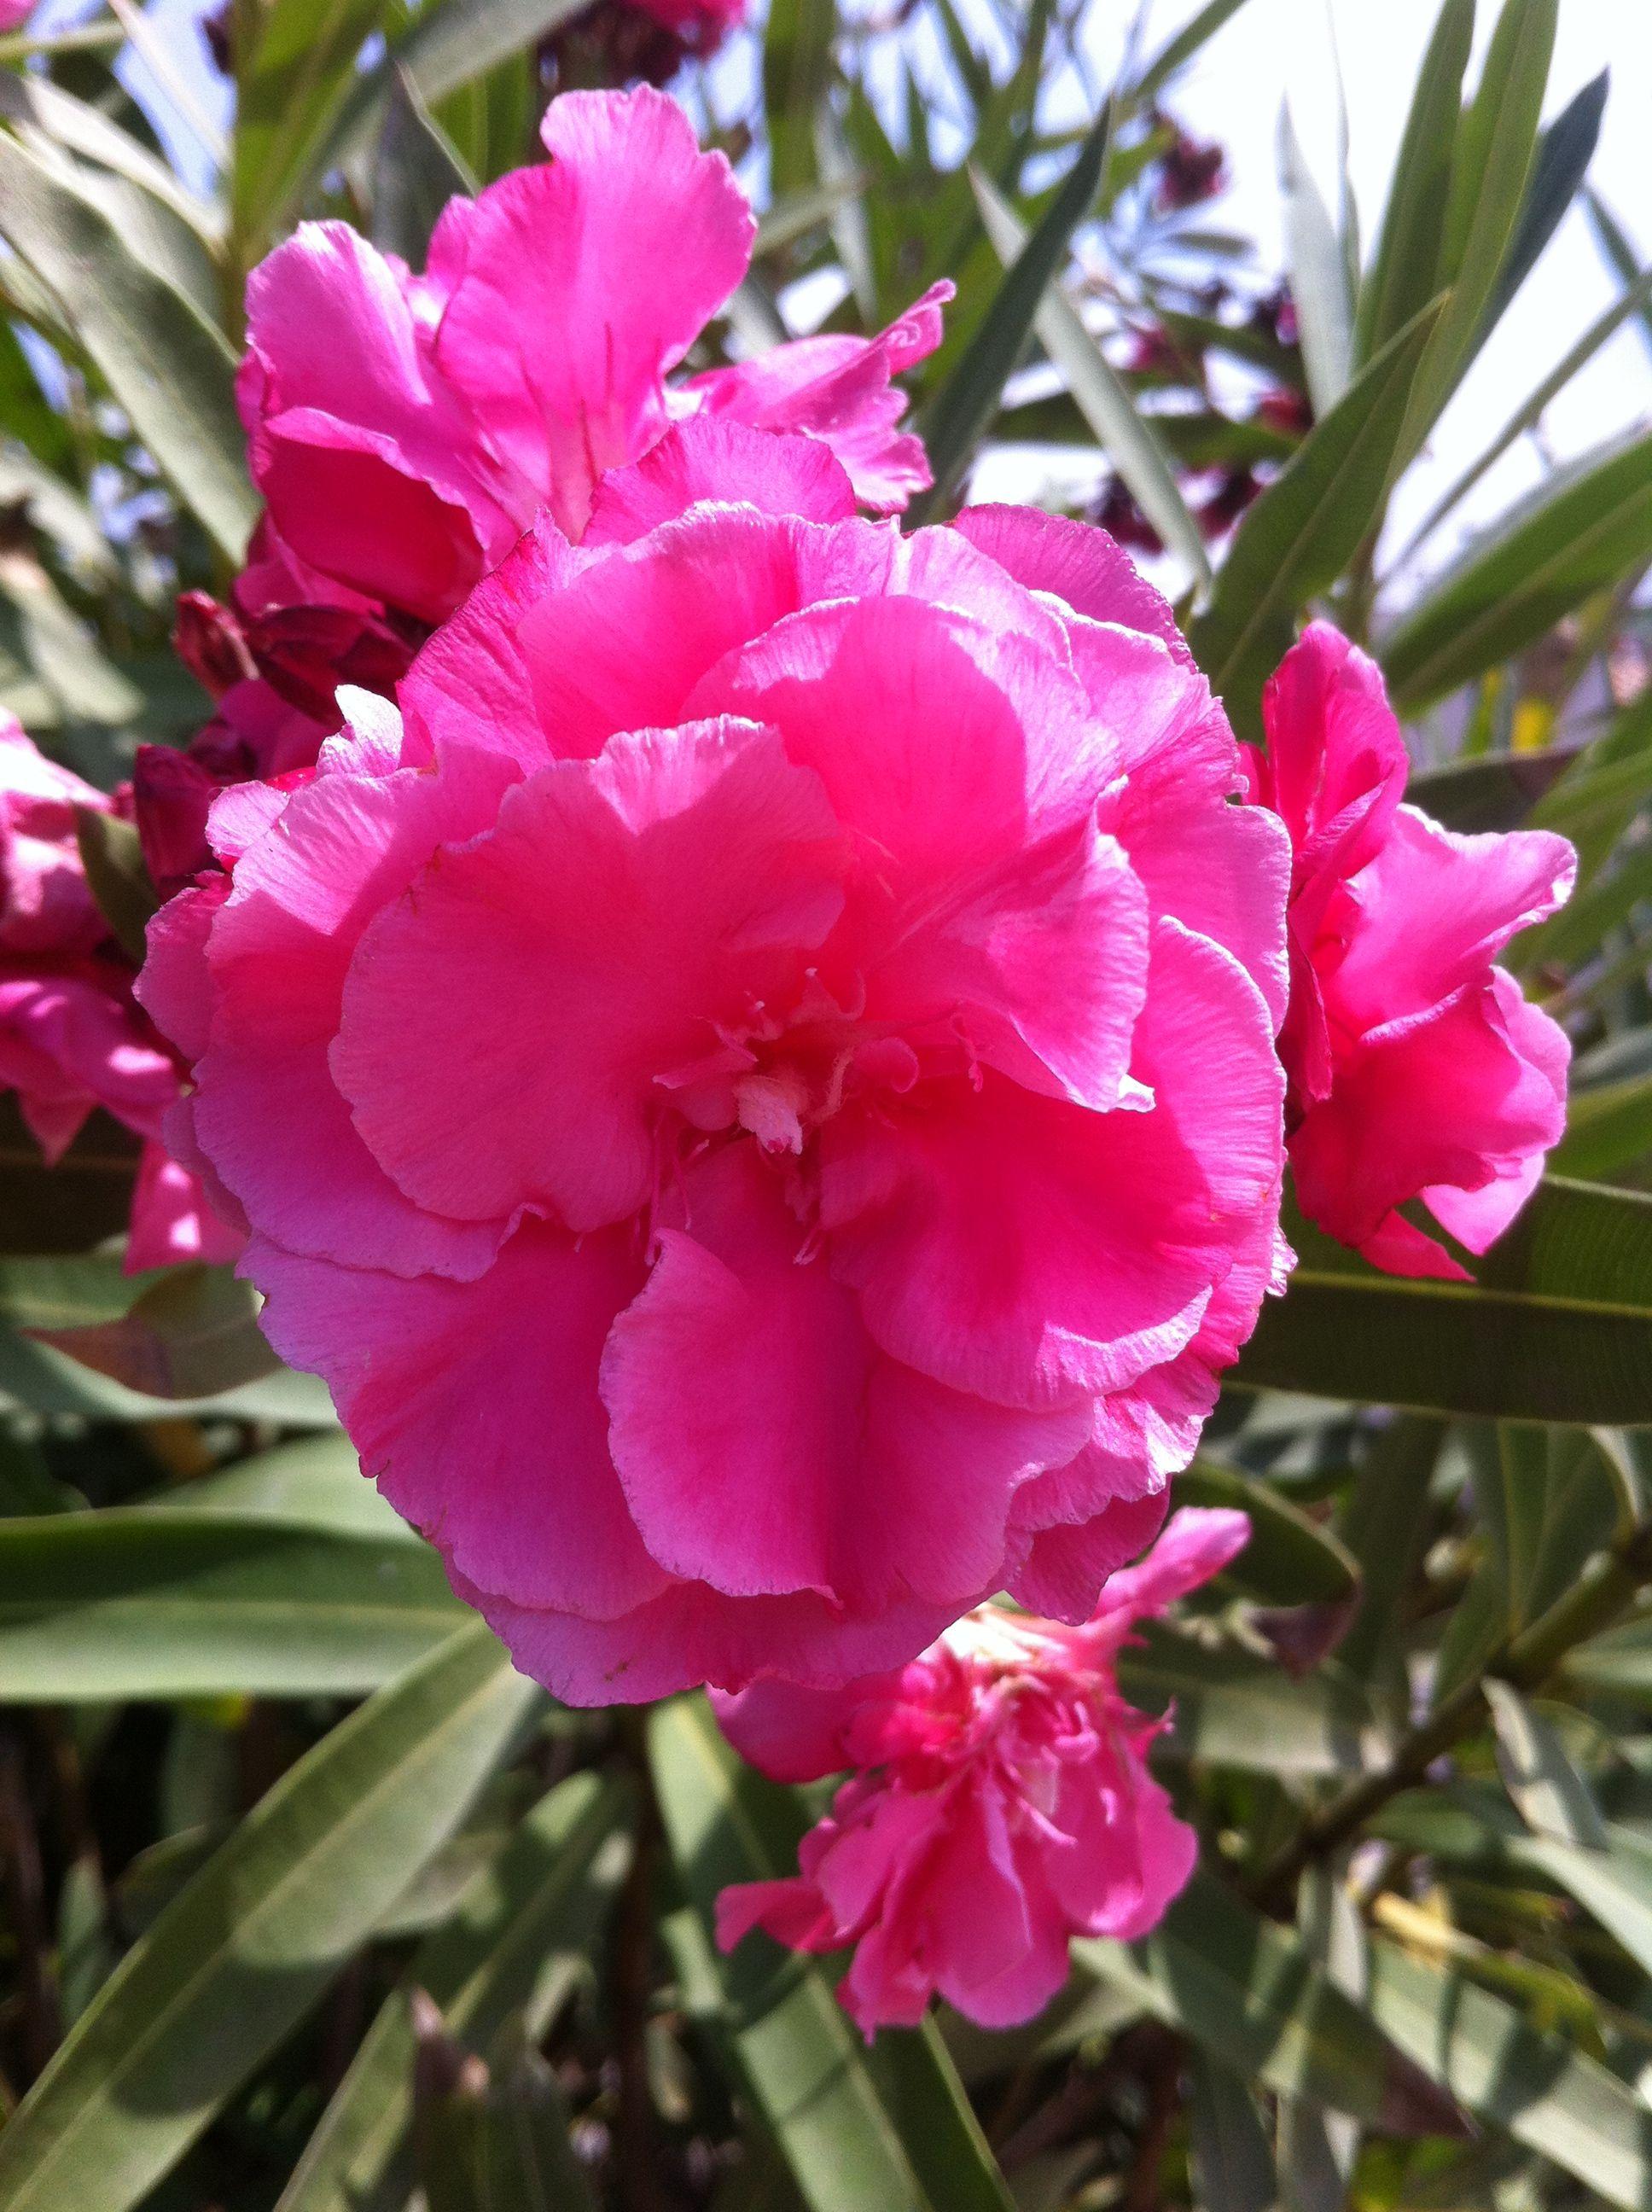 Pink Flowering Shrub Flora Of Malta Pinterest Flowering Shrubs